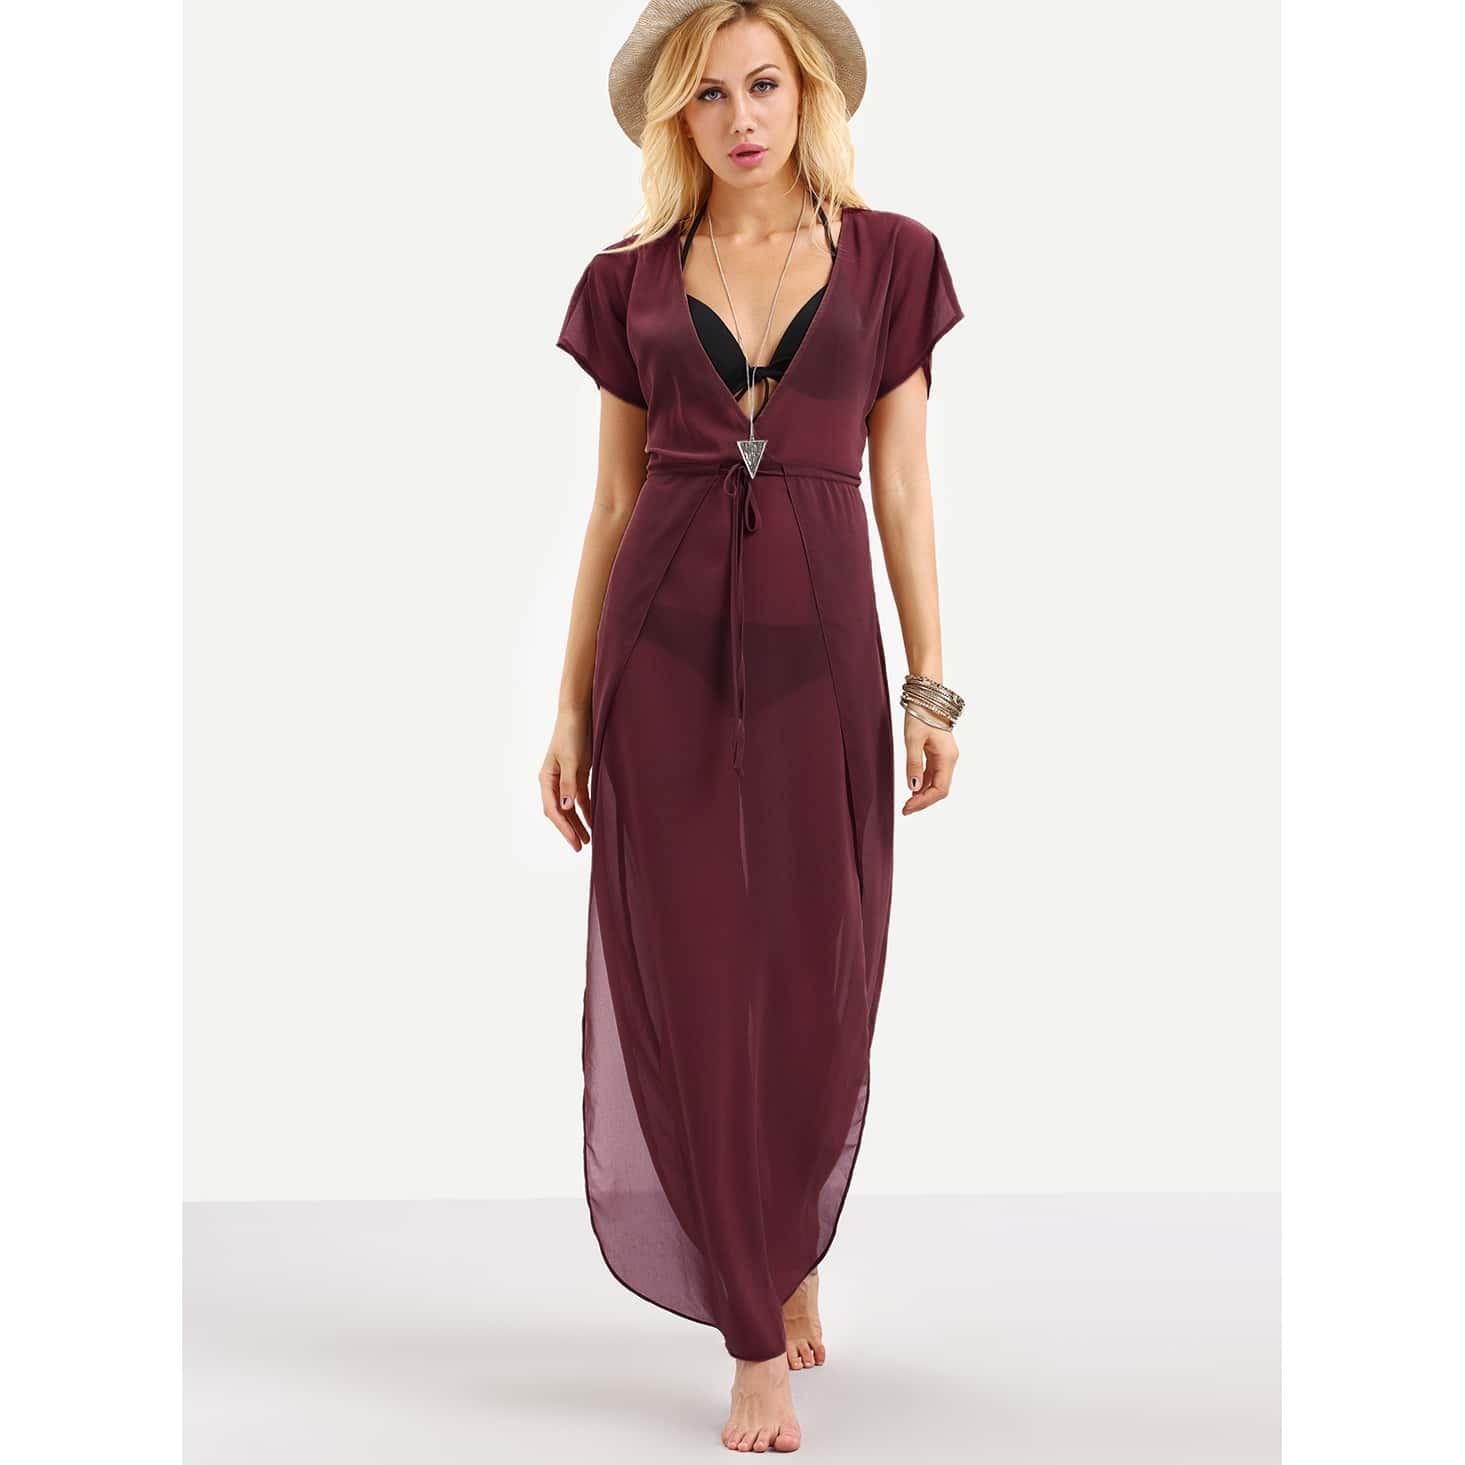 Plunge Neck Drawstring Waist Cover Up Dress